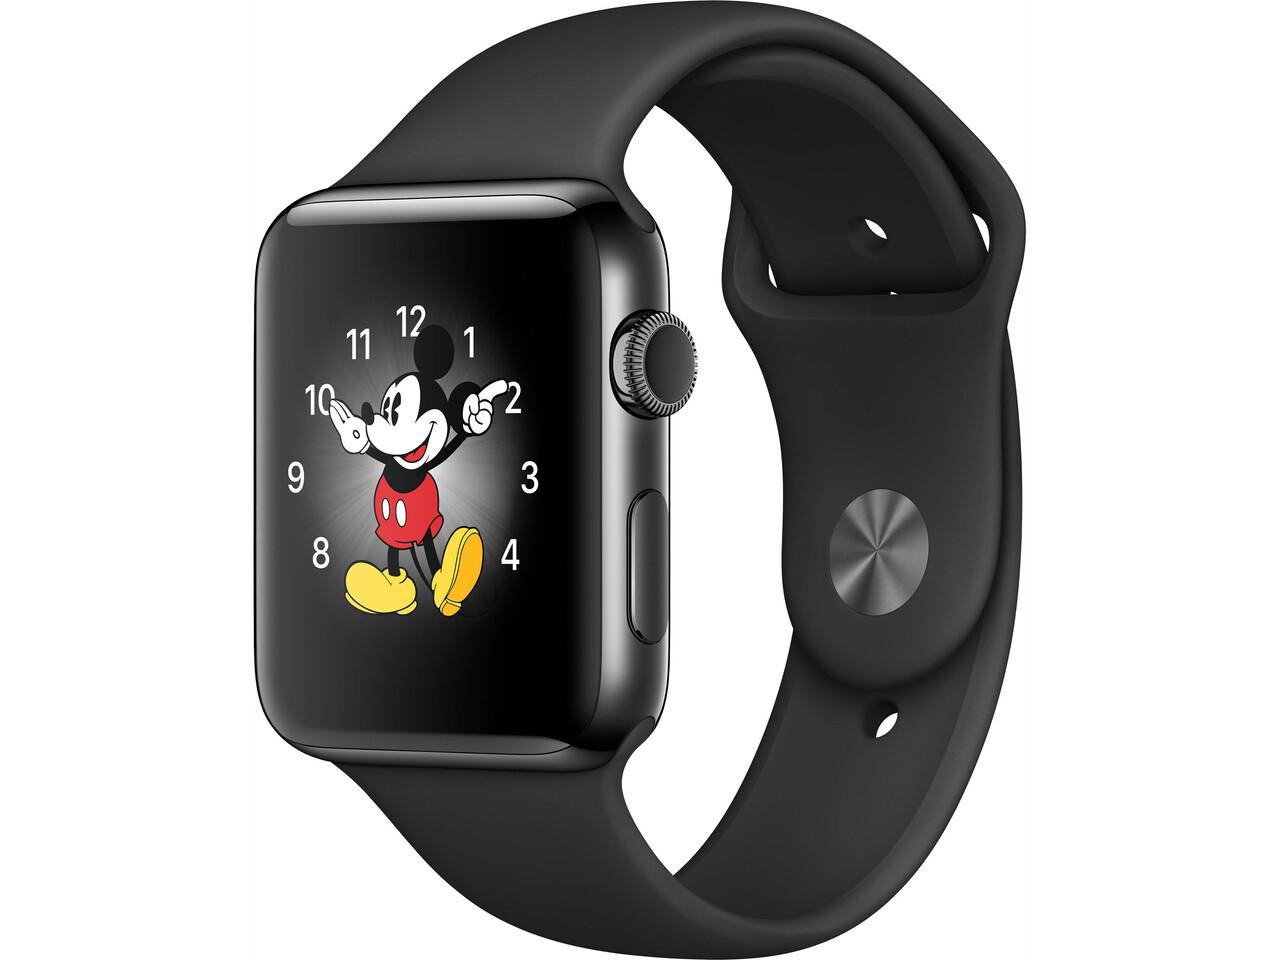 apple watch series 2 42mm space black stainless steel space black sport band